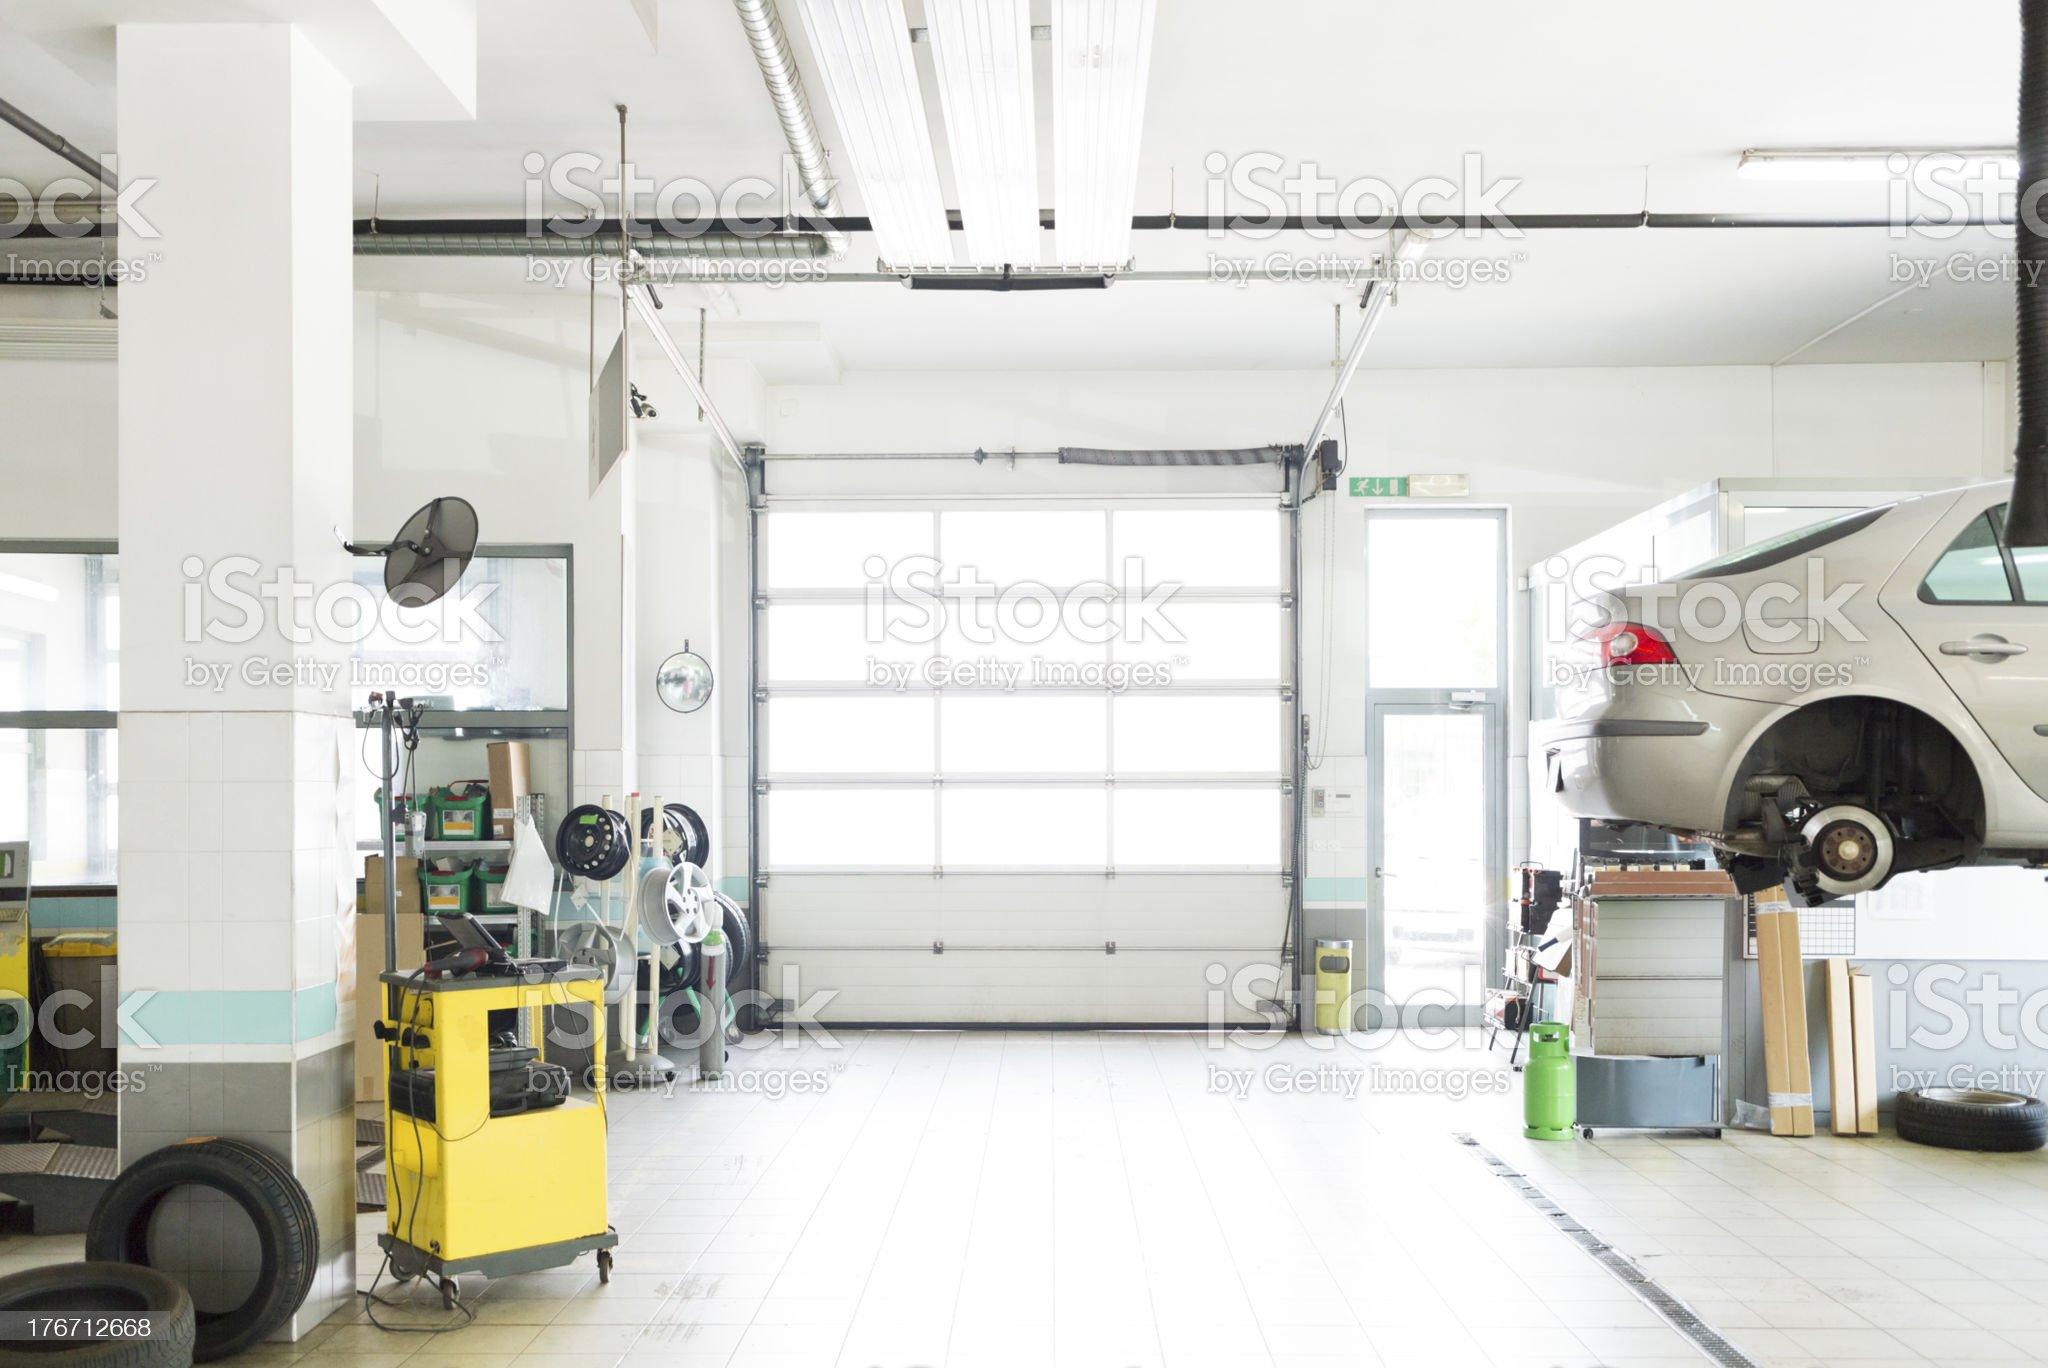 Auto repair shop, car garage, royalty-free stock photo